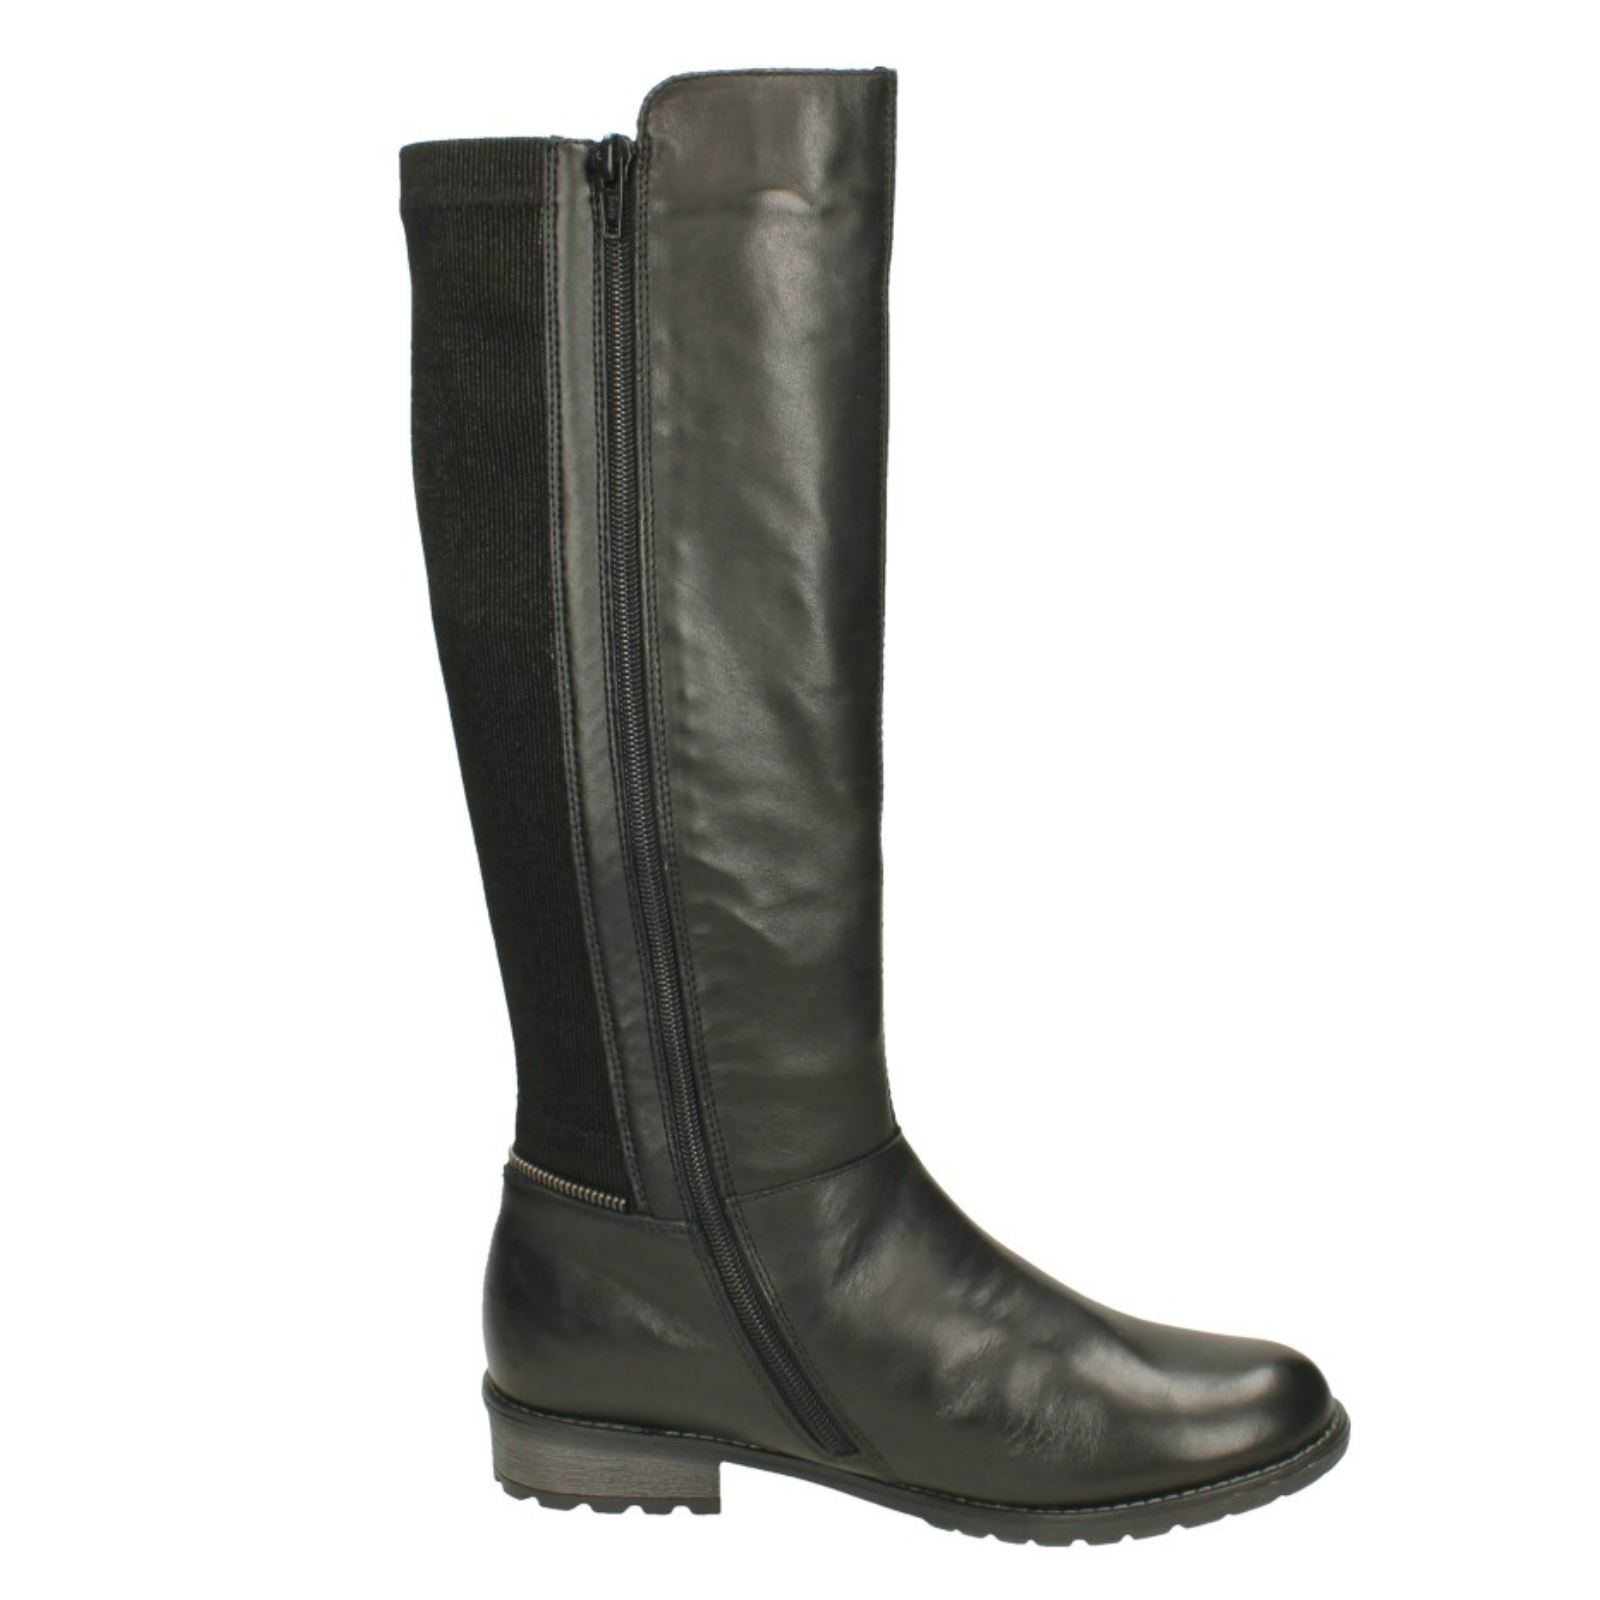 Larga señoras REMONTE REMONTE señoras botas R3325 426b37